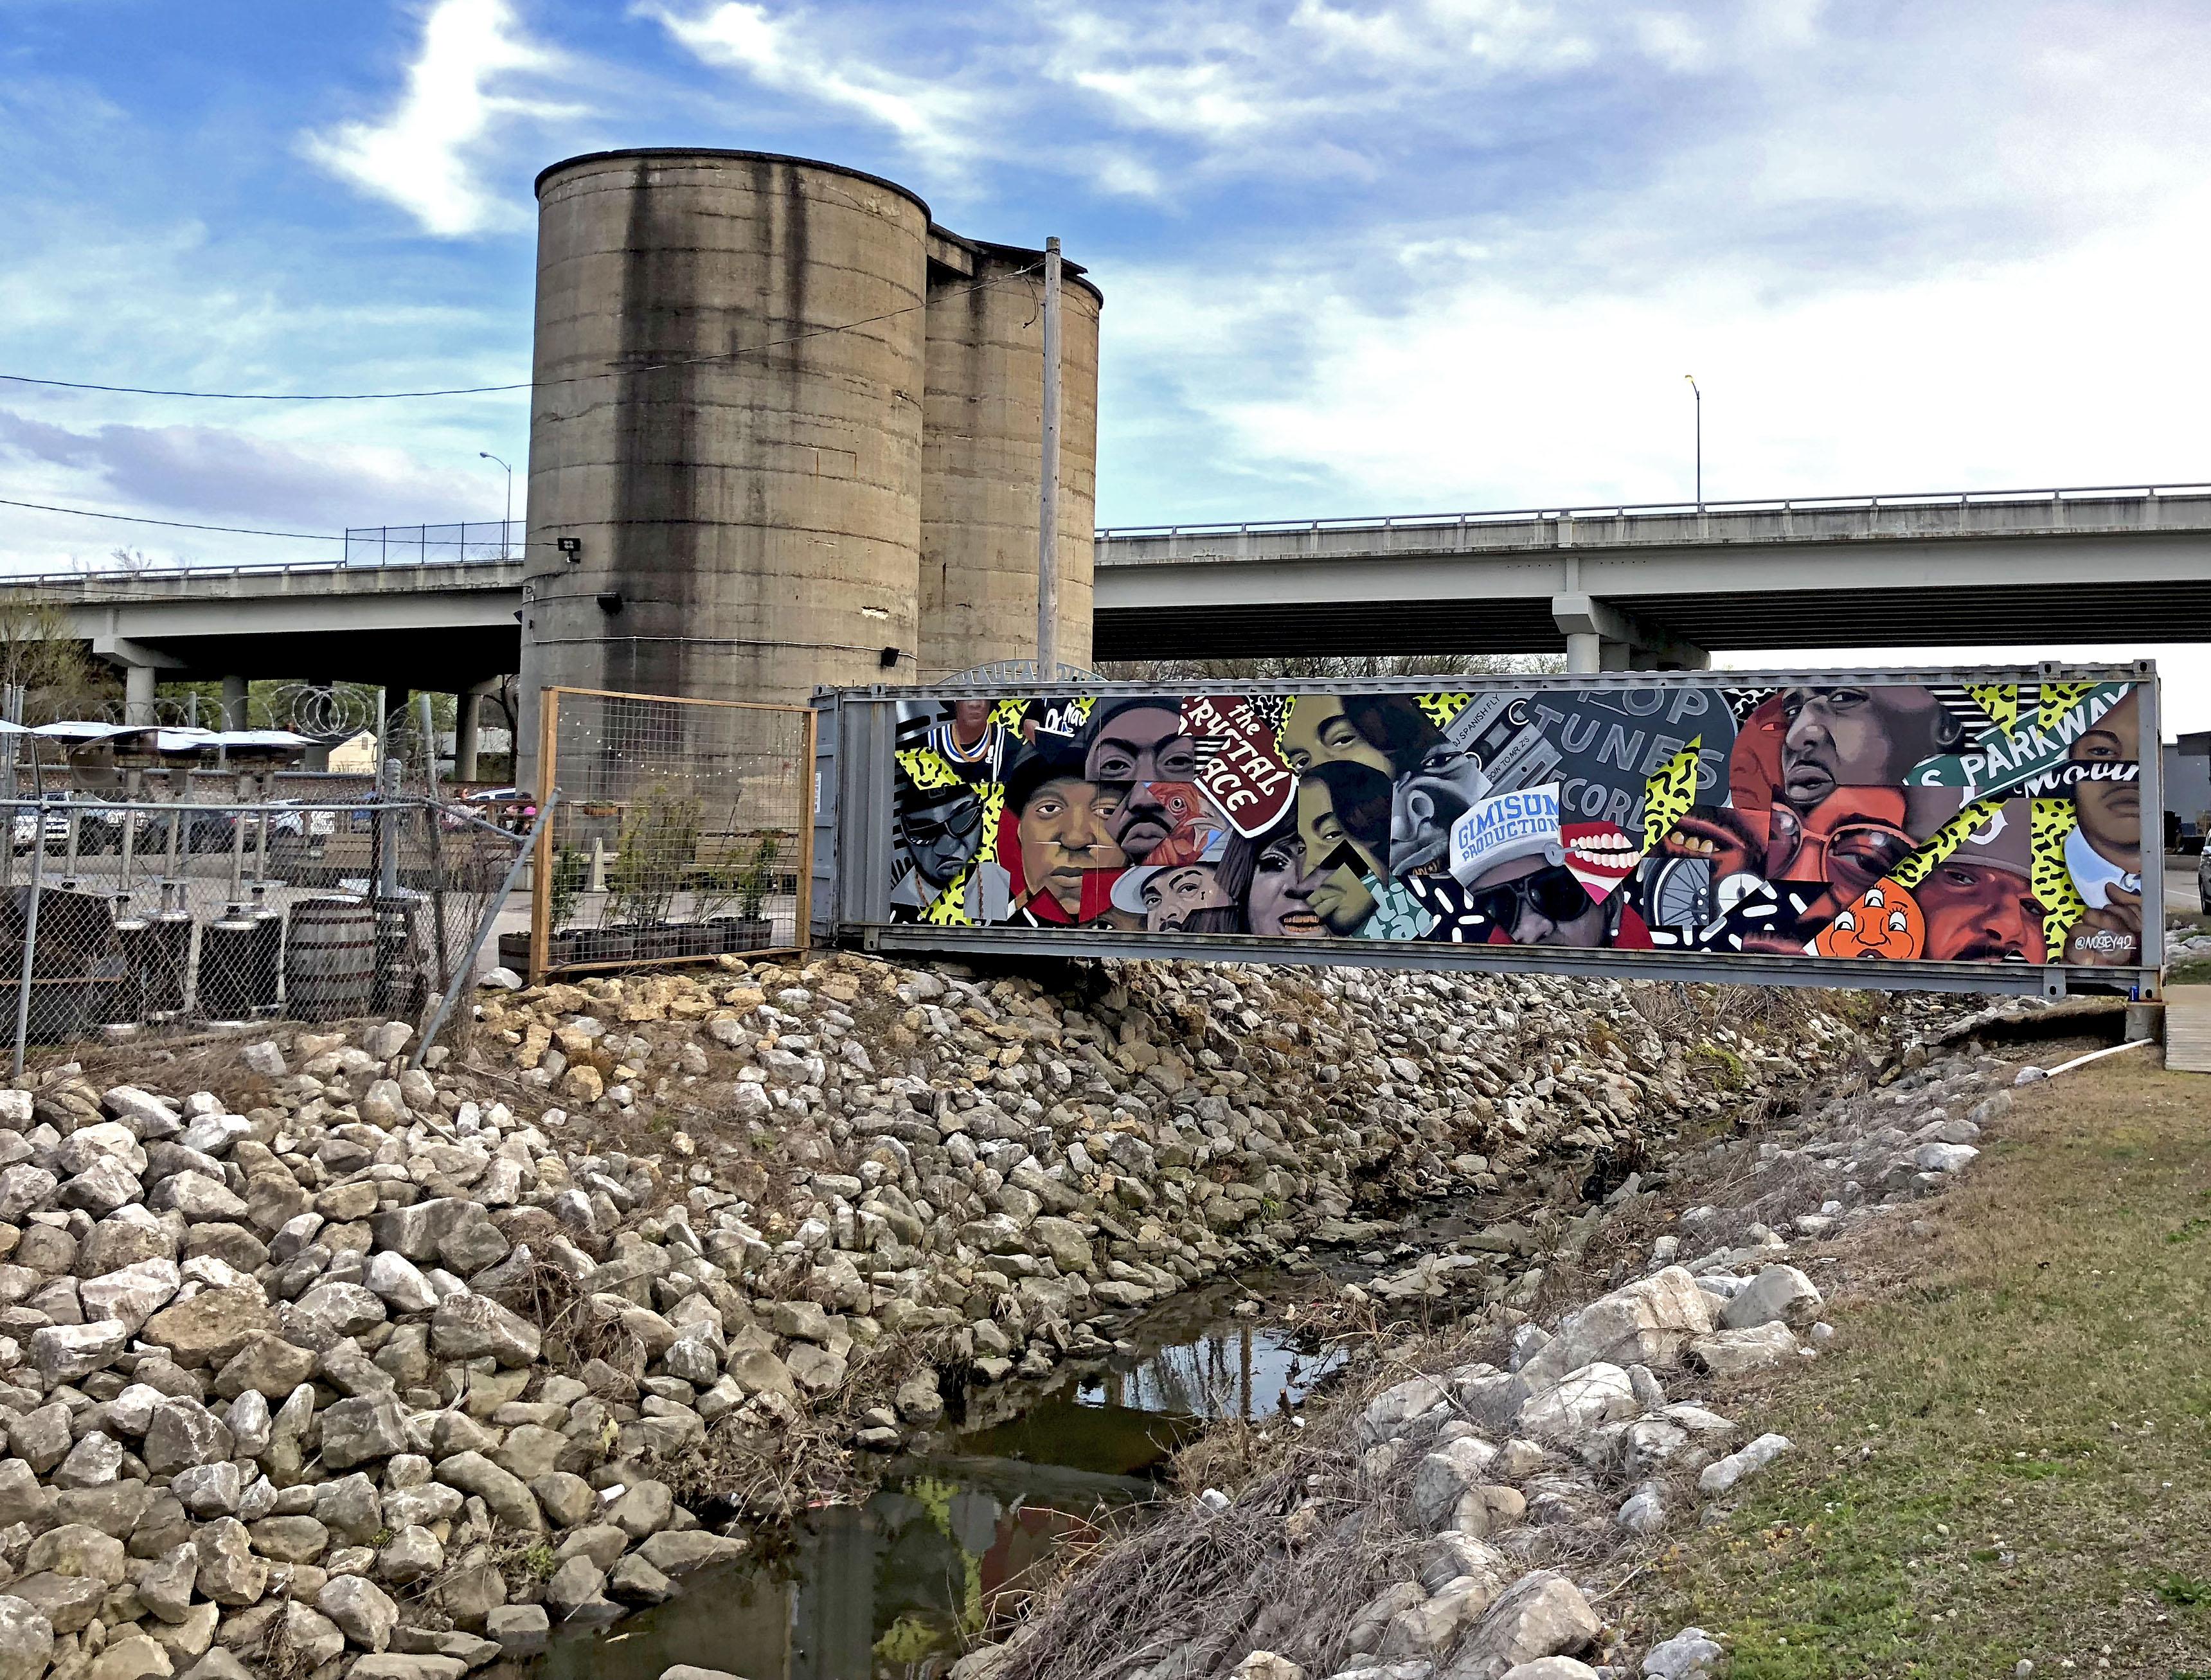 http://www.brandongaiamarshall.com/wp-content/uploads/2018/04/Memphis_Rap_Legends_Mural2.jpg